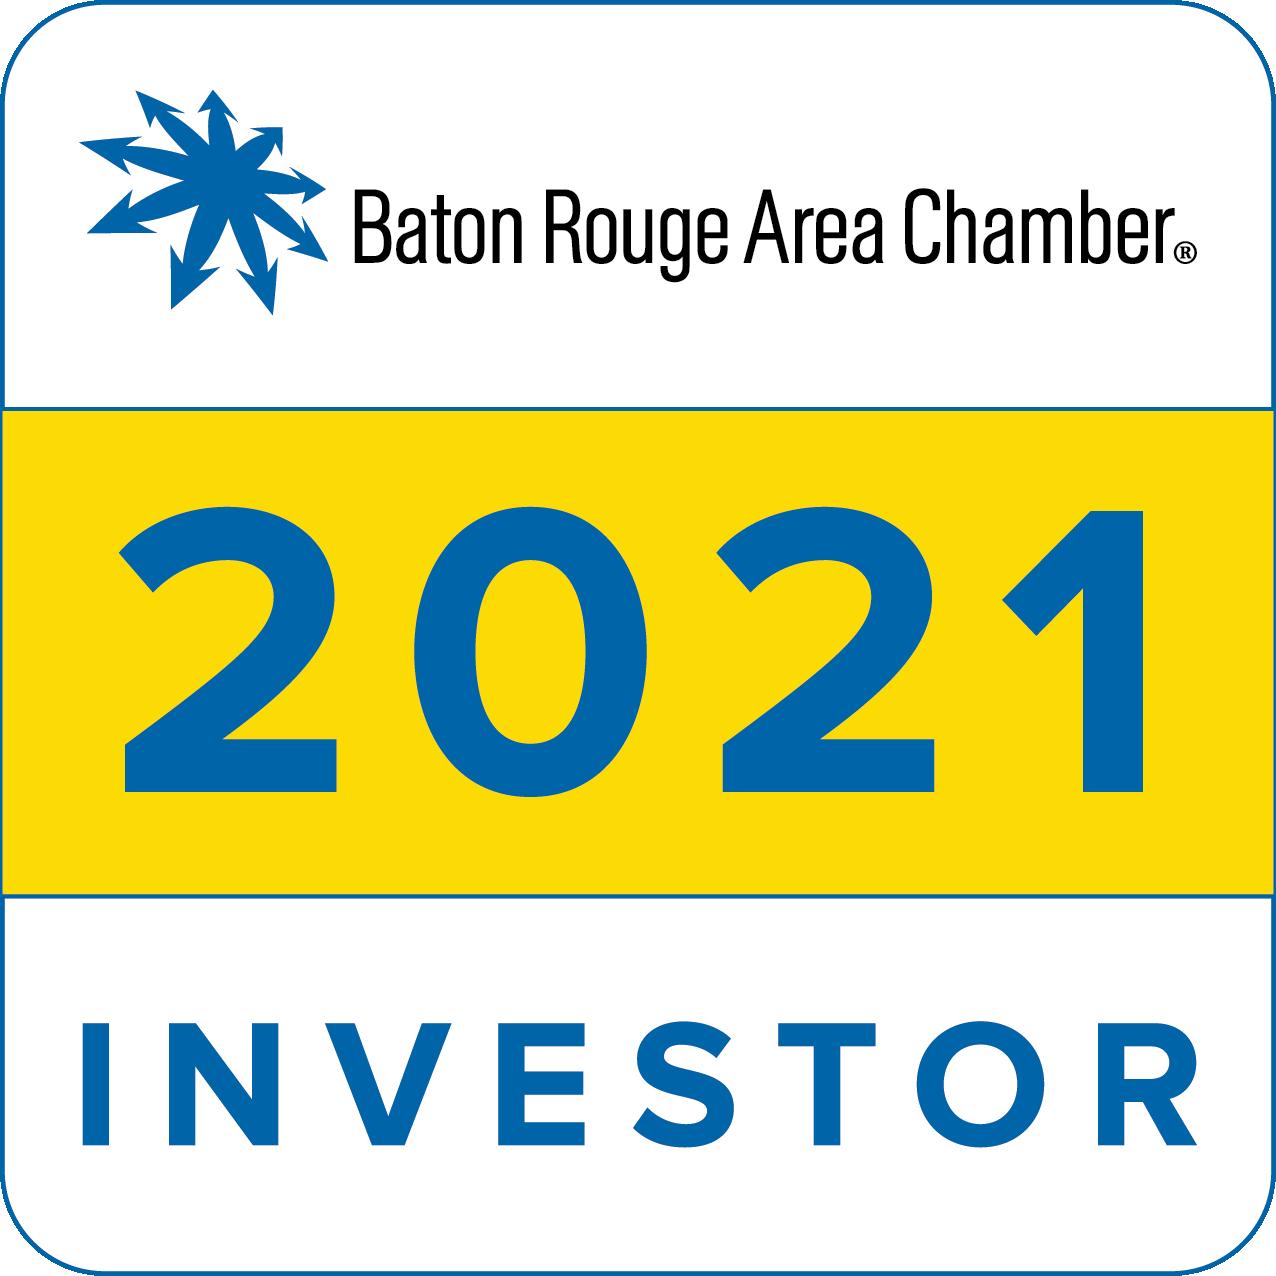 2021 Baton Rouge Area Chamber Investor